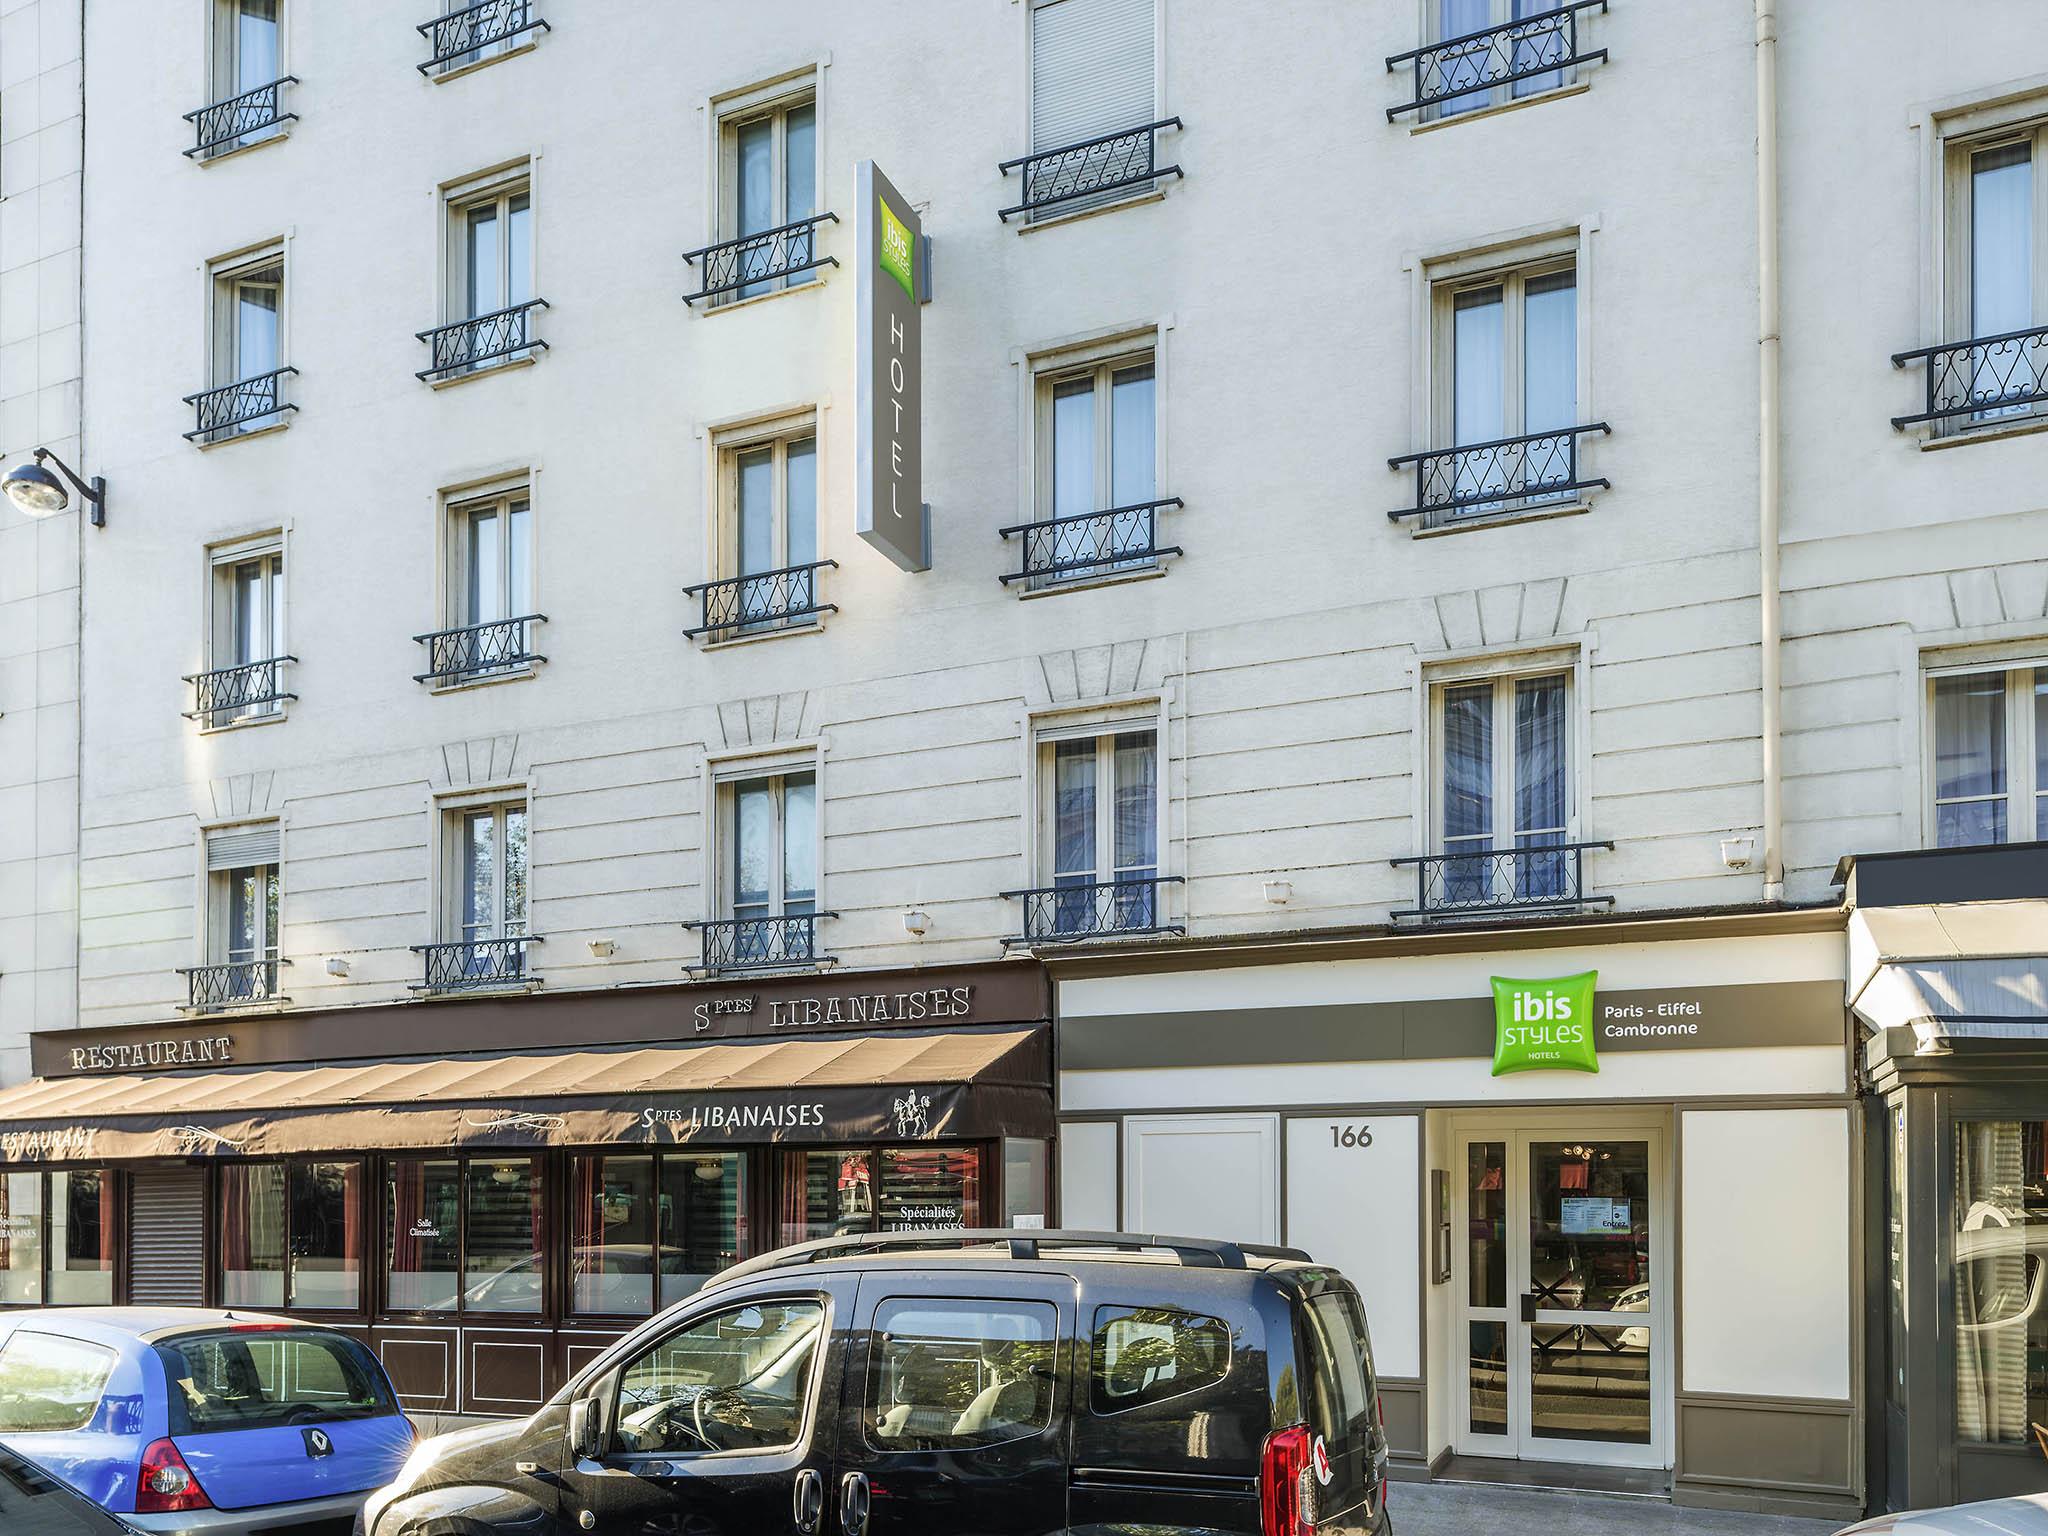 Hotel Ibis Paris Tour Eiffel Cambronne